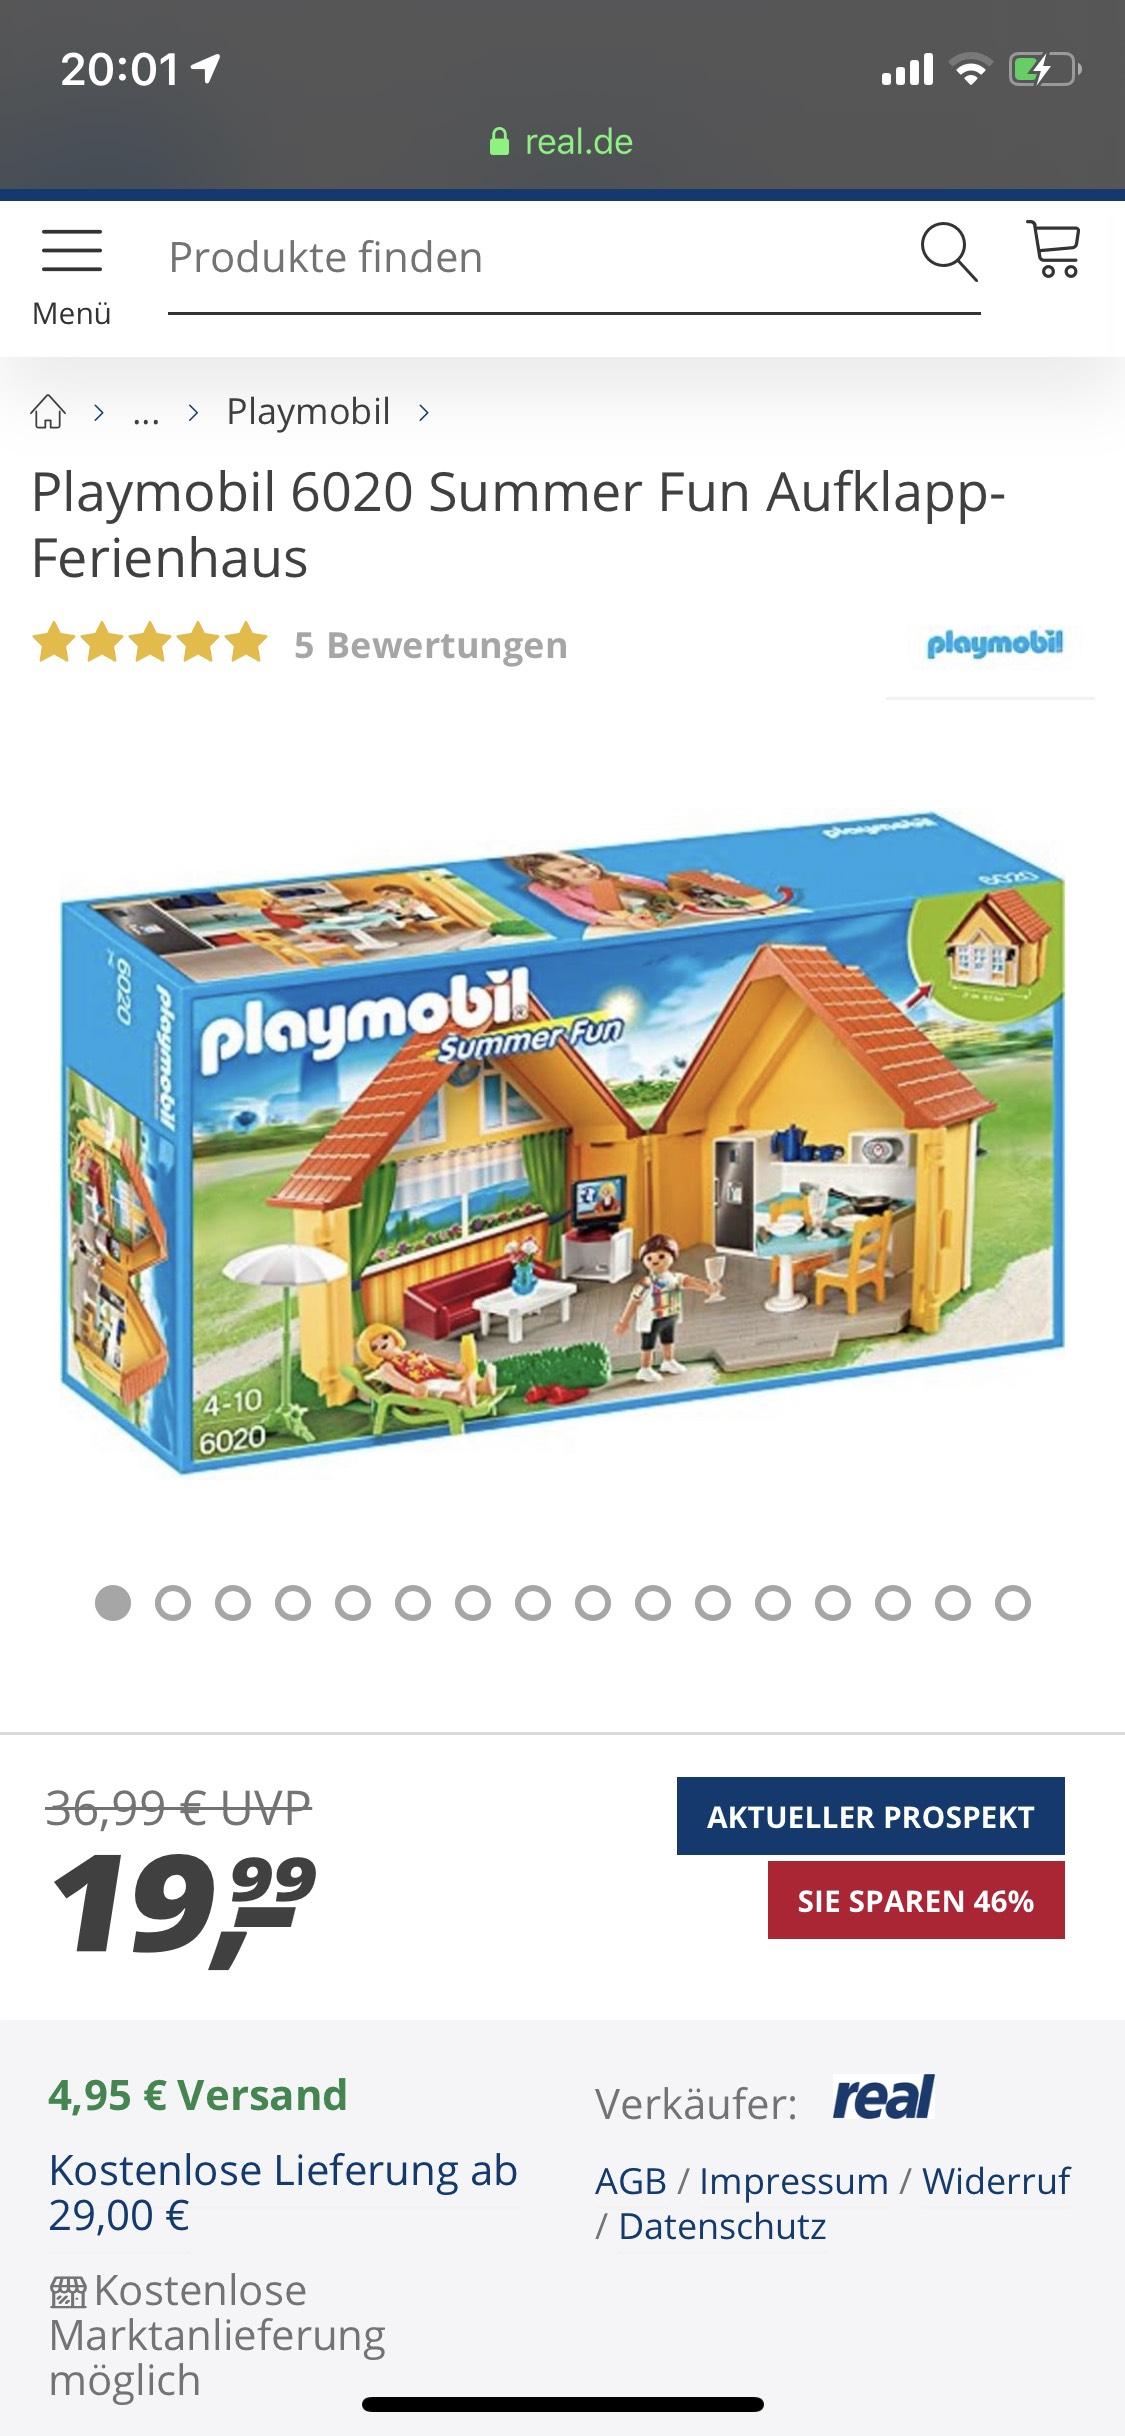 Playmobil Summer Fun Aufklappferienhaus